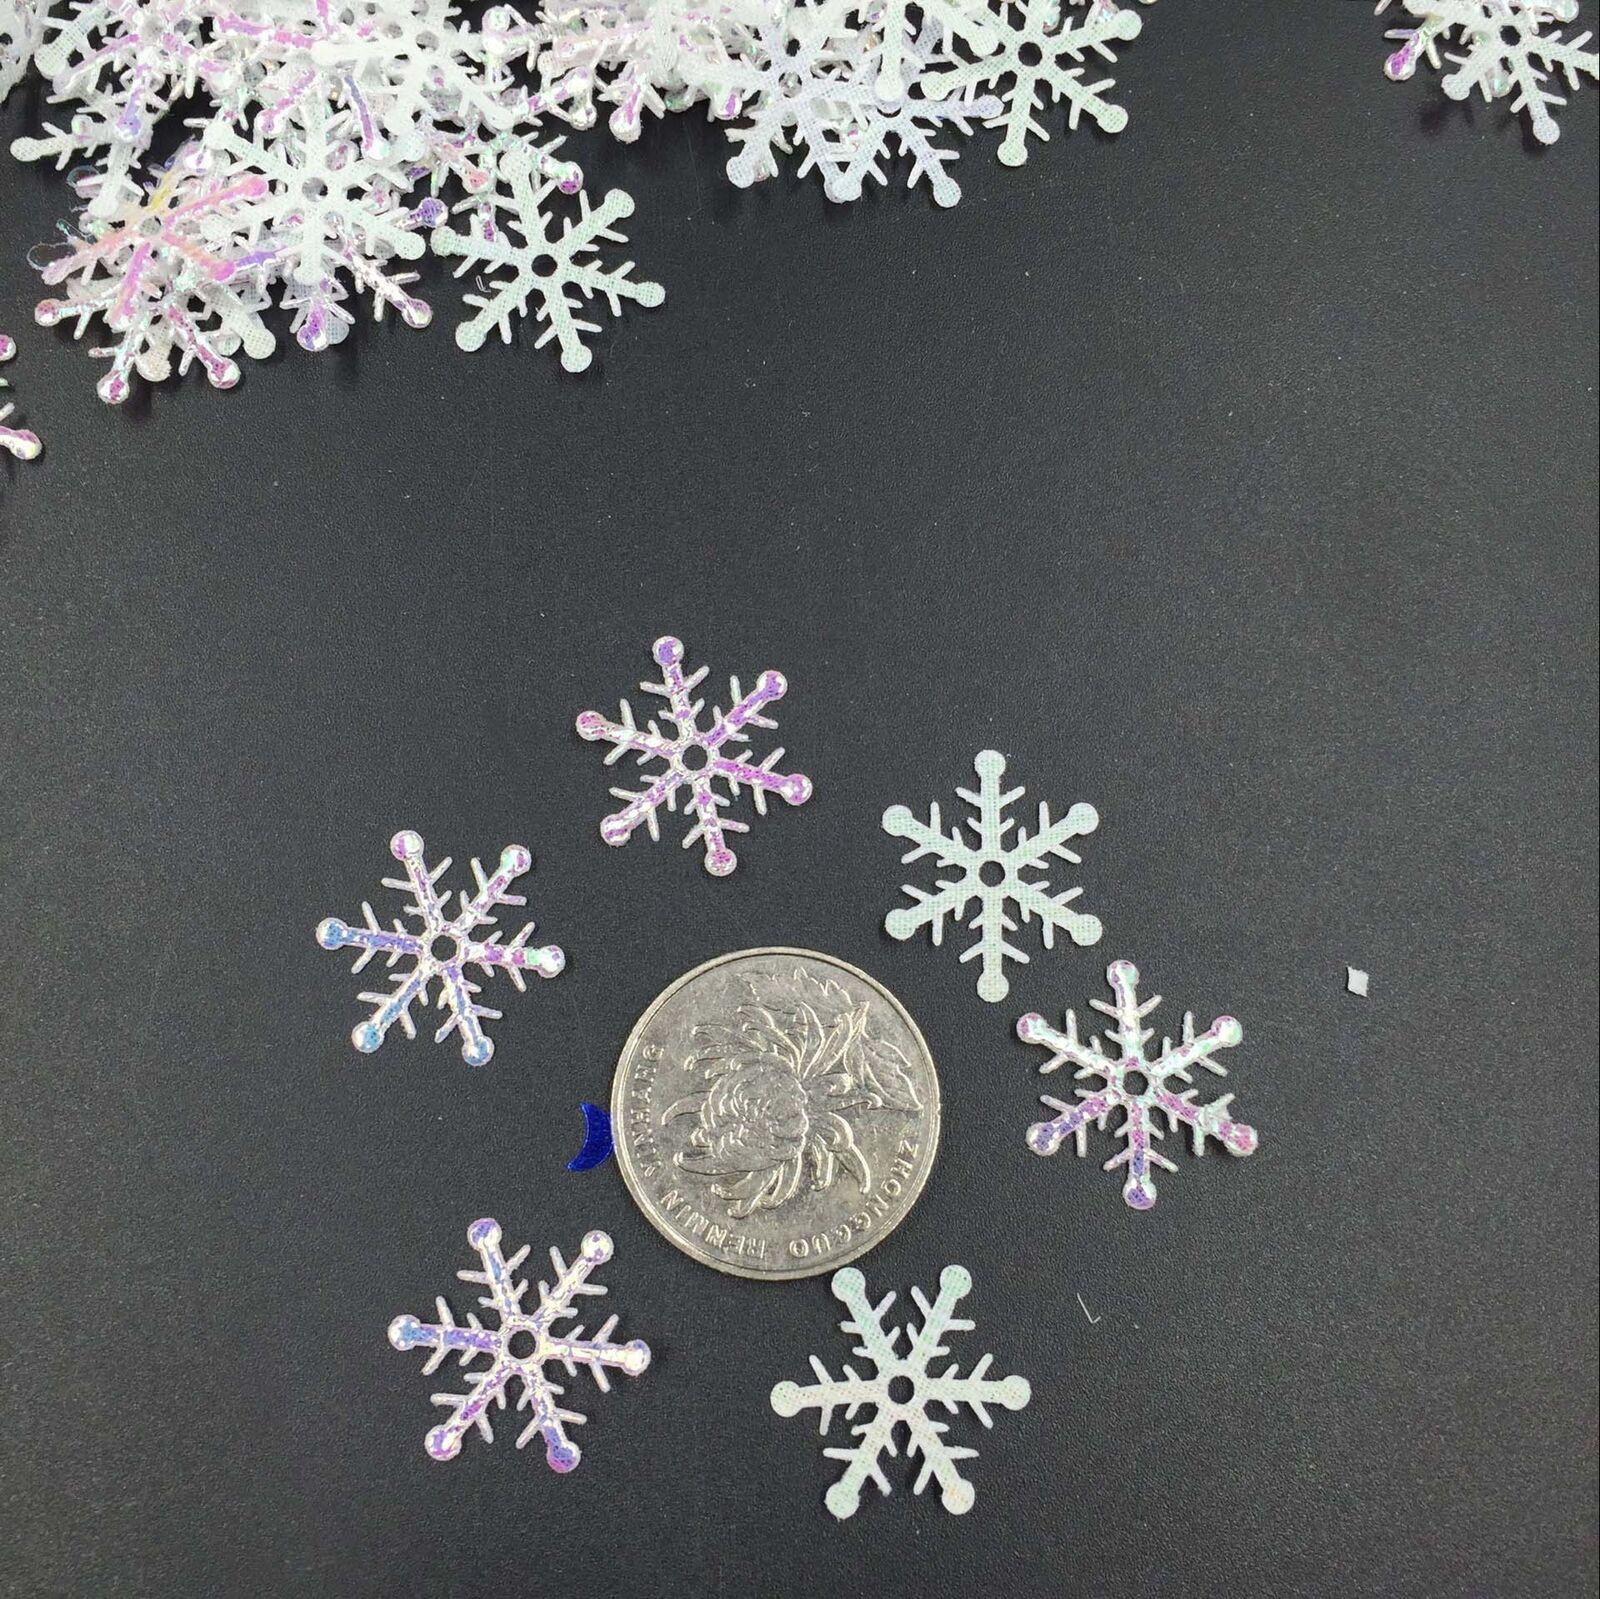 300pcs //Bag Classic Snowflake Ornaments Christmas Tress Party Wedding U7F5